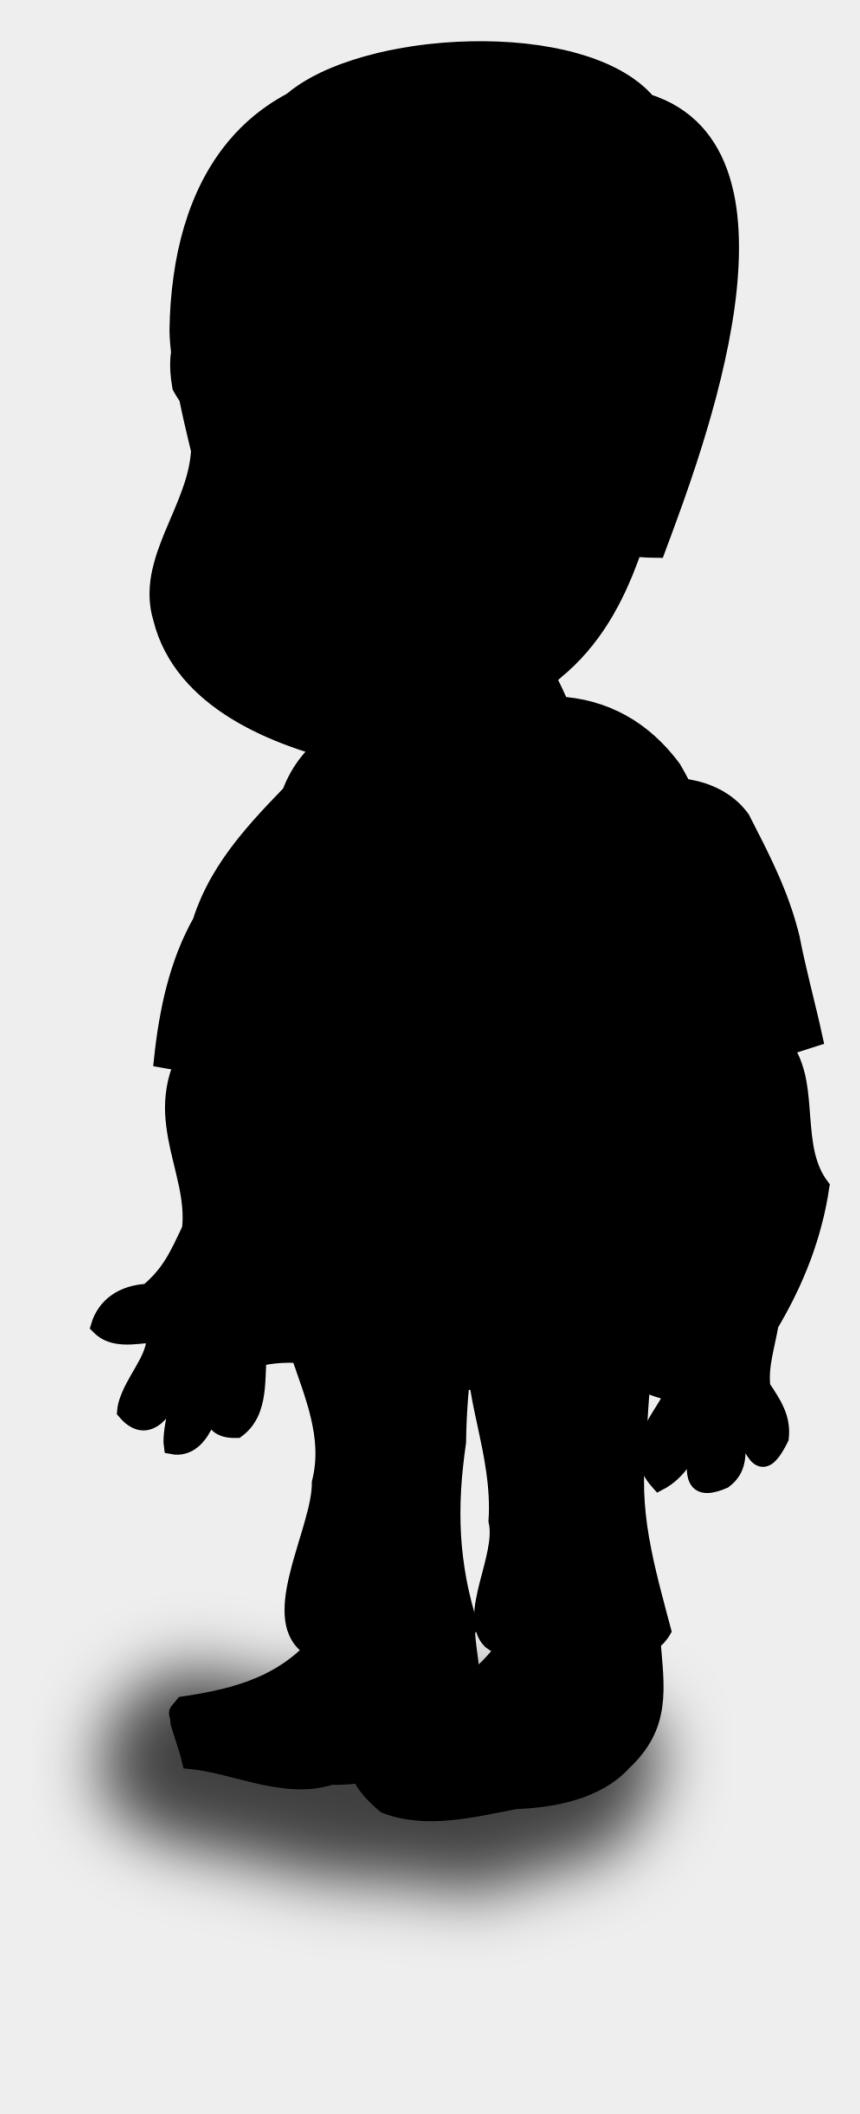 behavior clip art, Cartoons - Human Behavior Male Silhouette Clip Art - Illustration